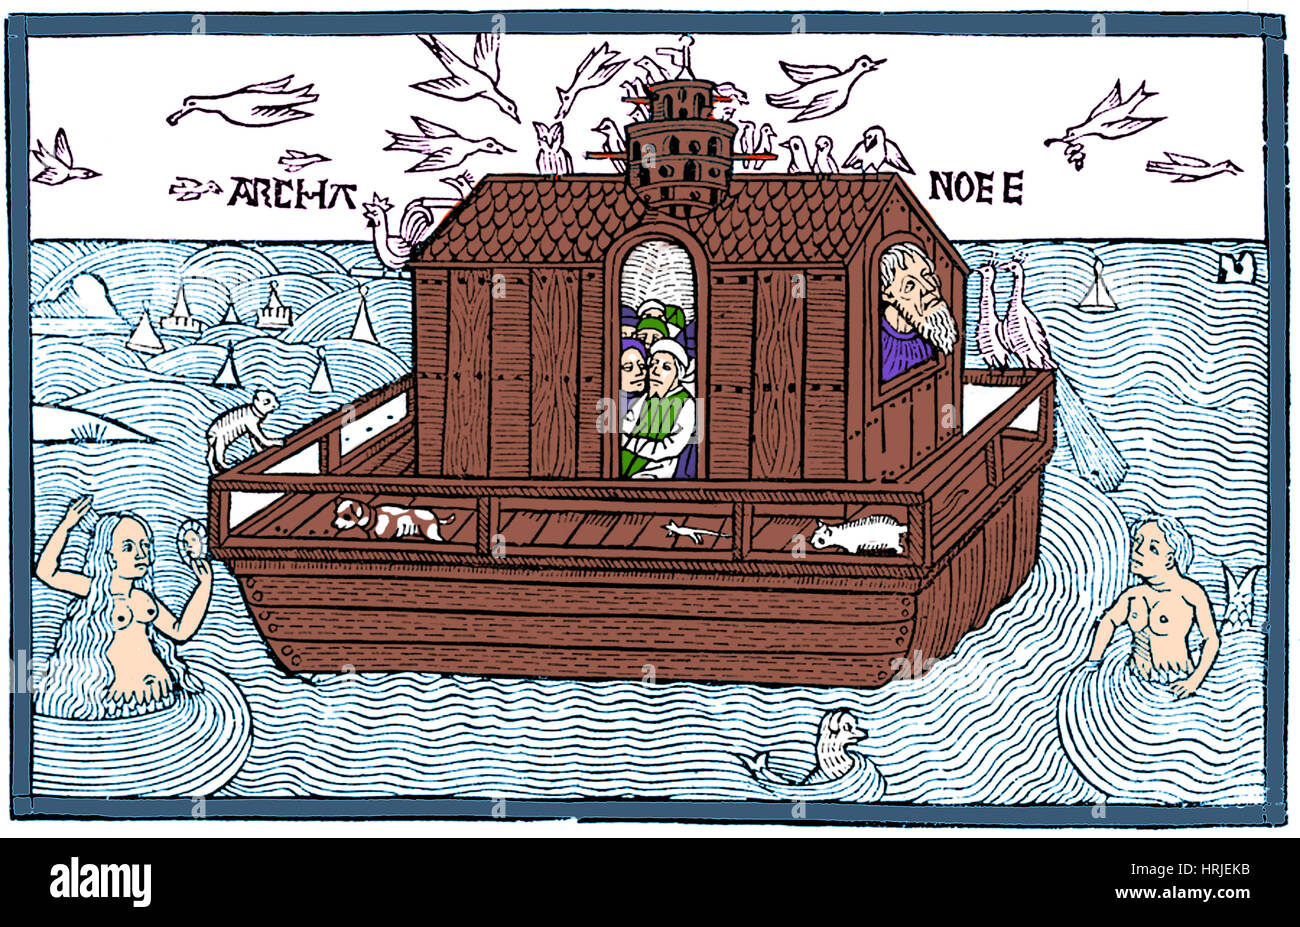 Noah's Ark with Merfolk, 1493 - Stock Image